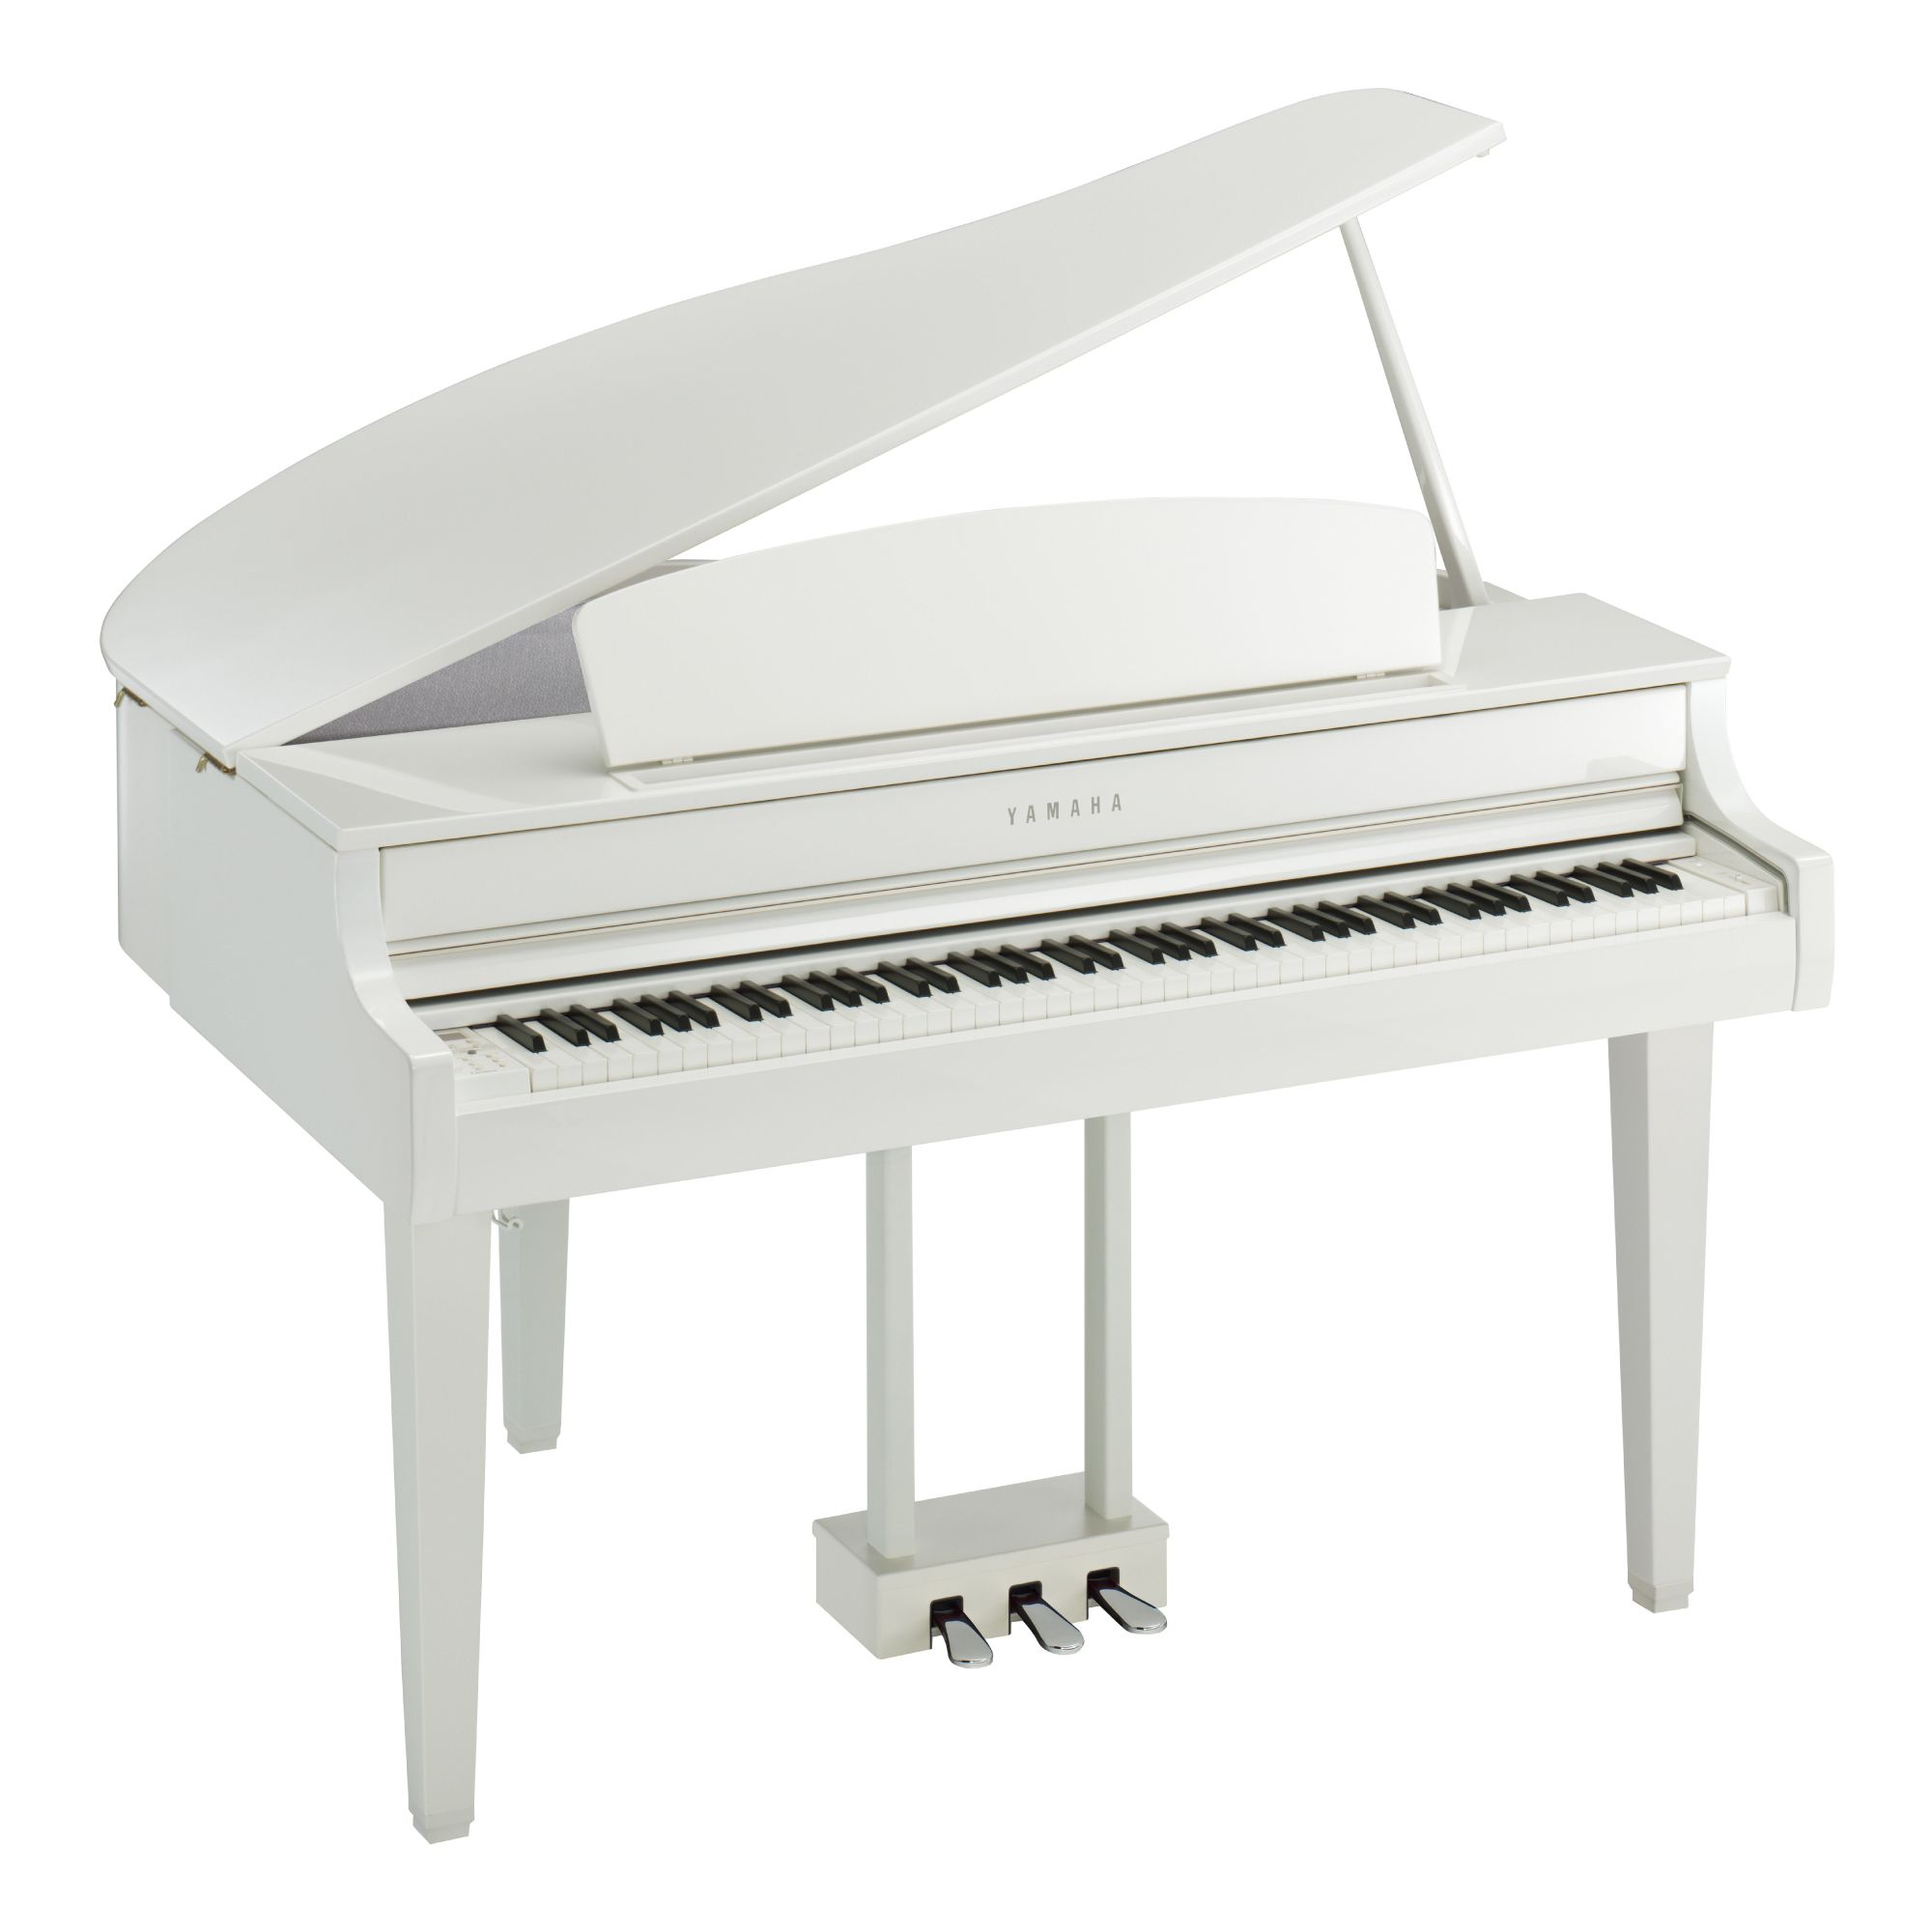 Yamaha CLP-765GP polished white Clavinova CLP700 stage digitale keyboard home piano mezza coda muro strumenti musicali